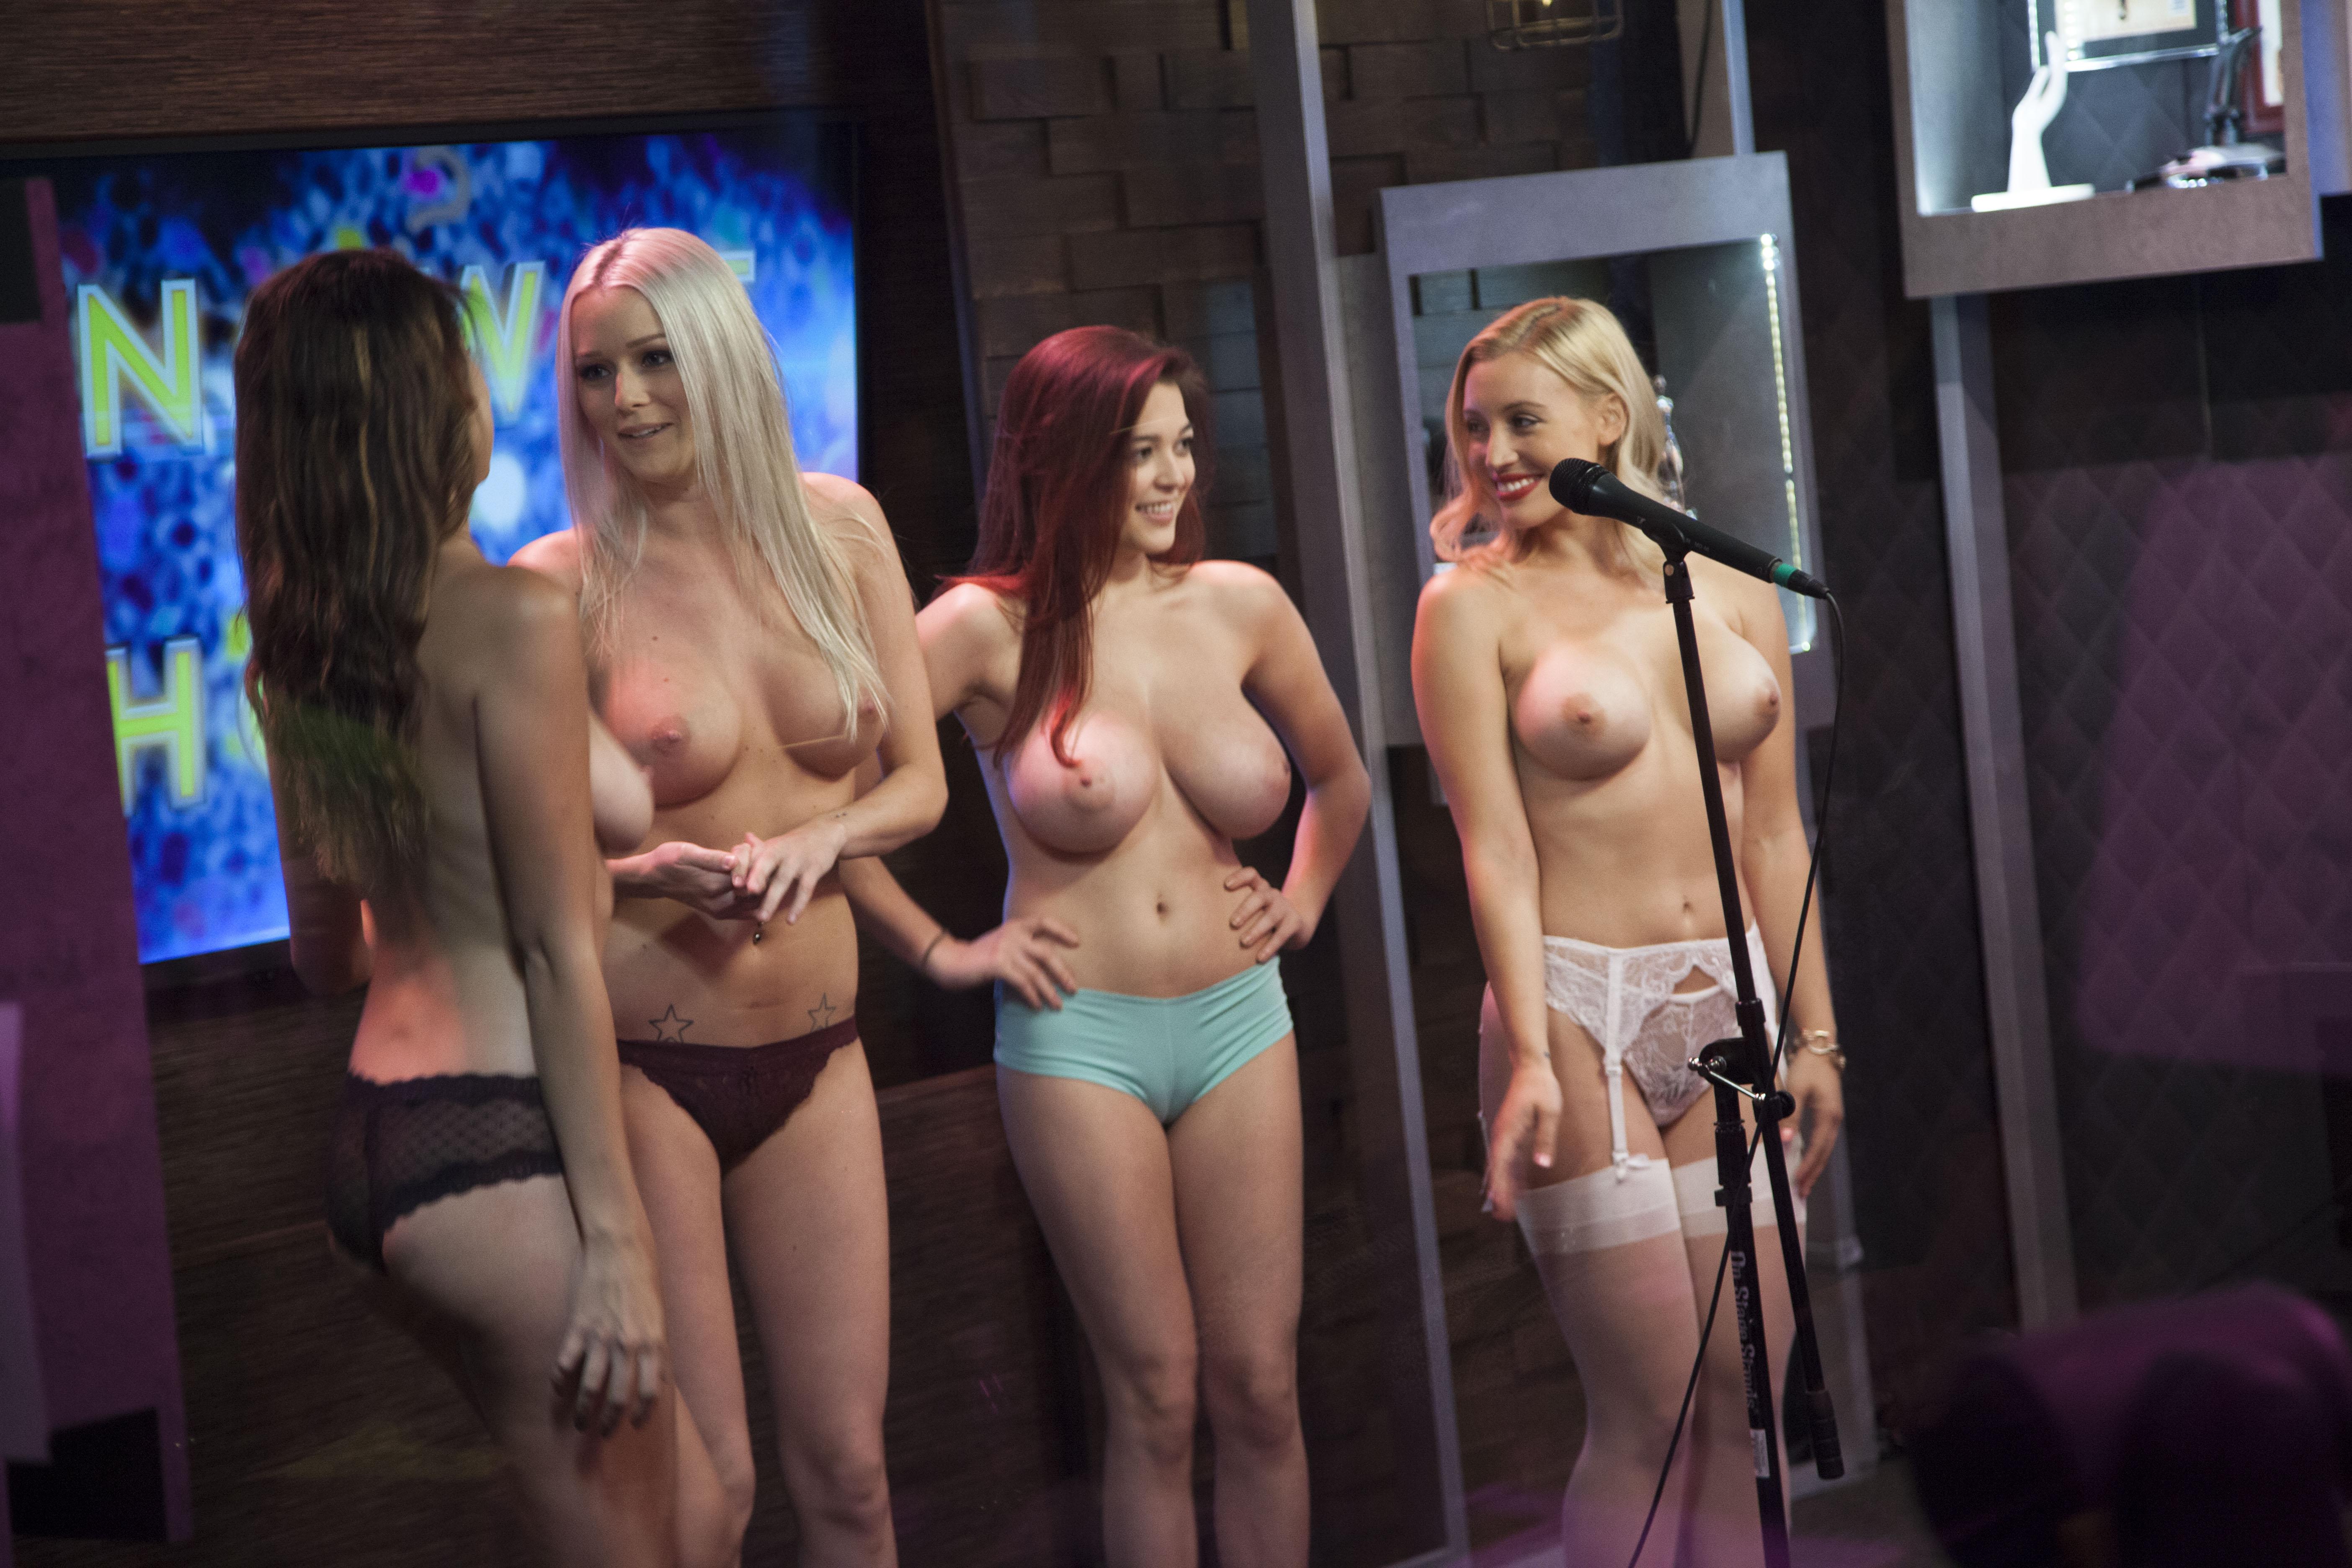 playboy tv s nude videos